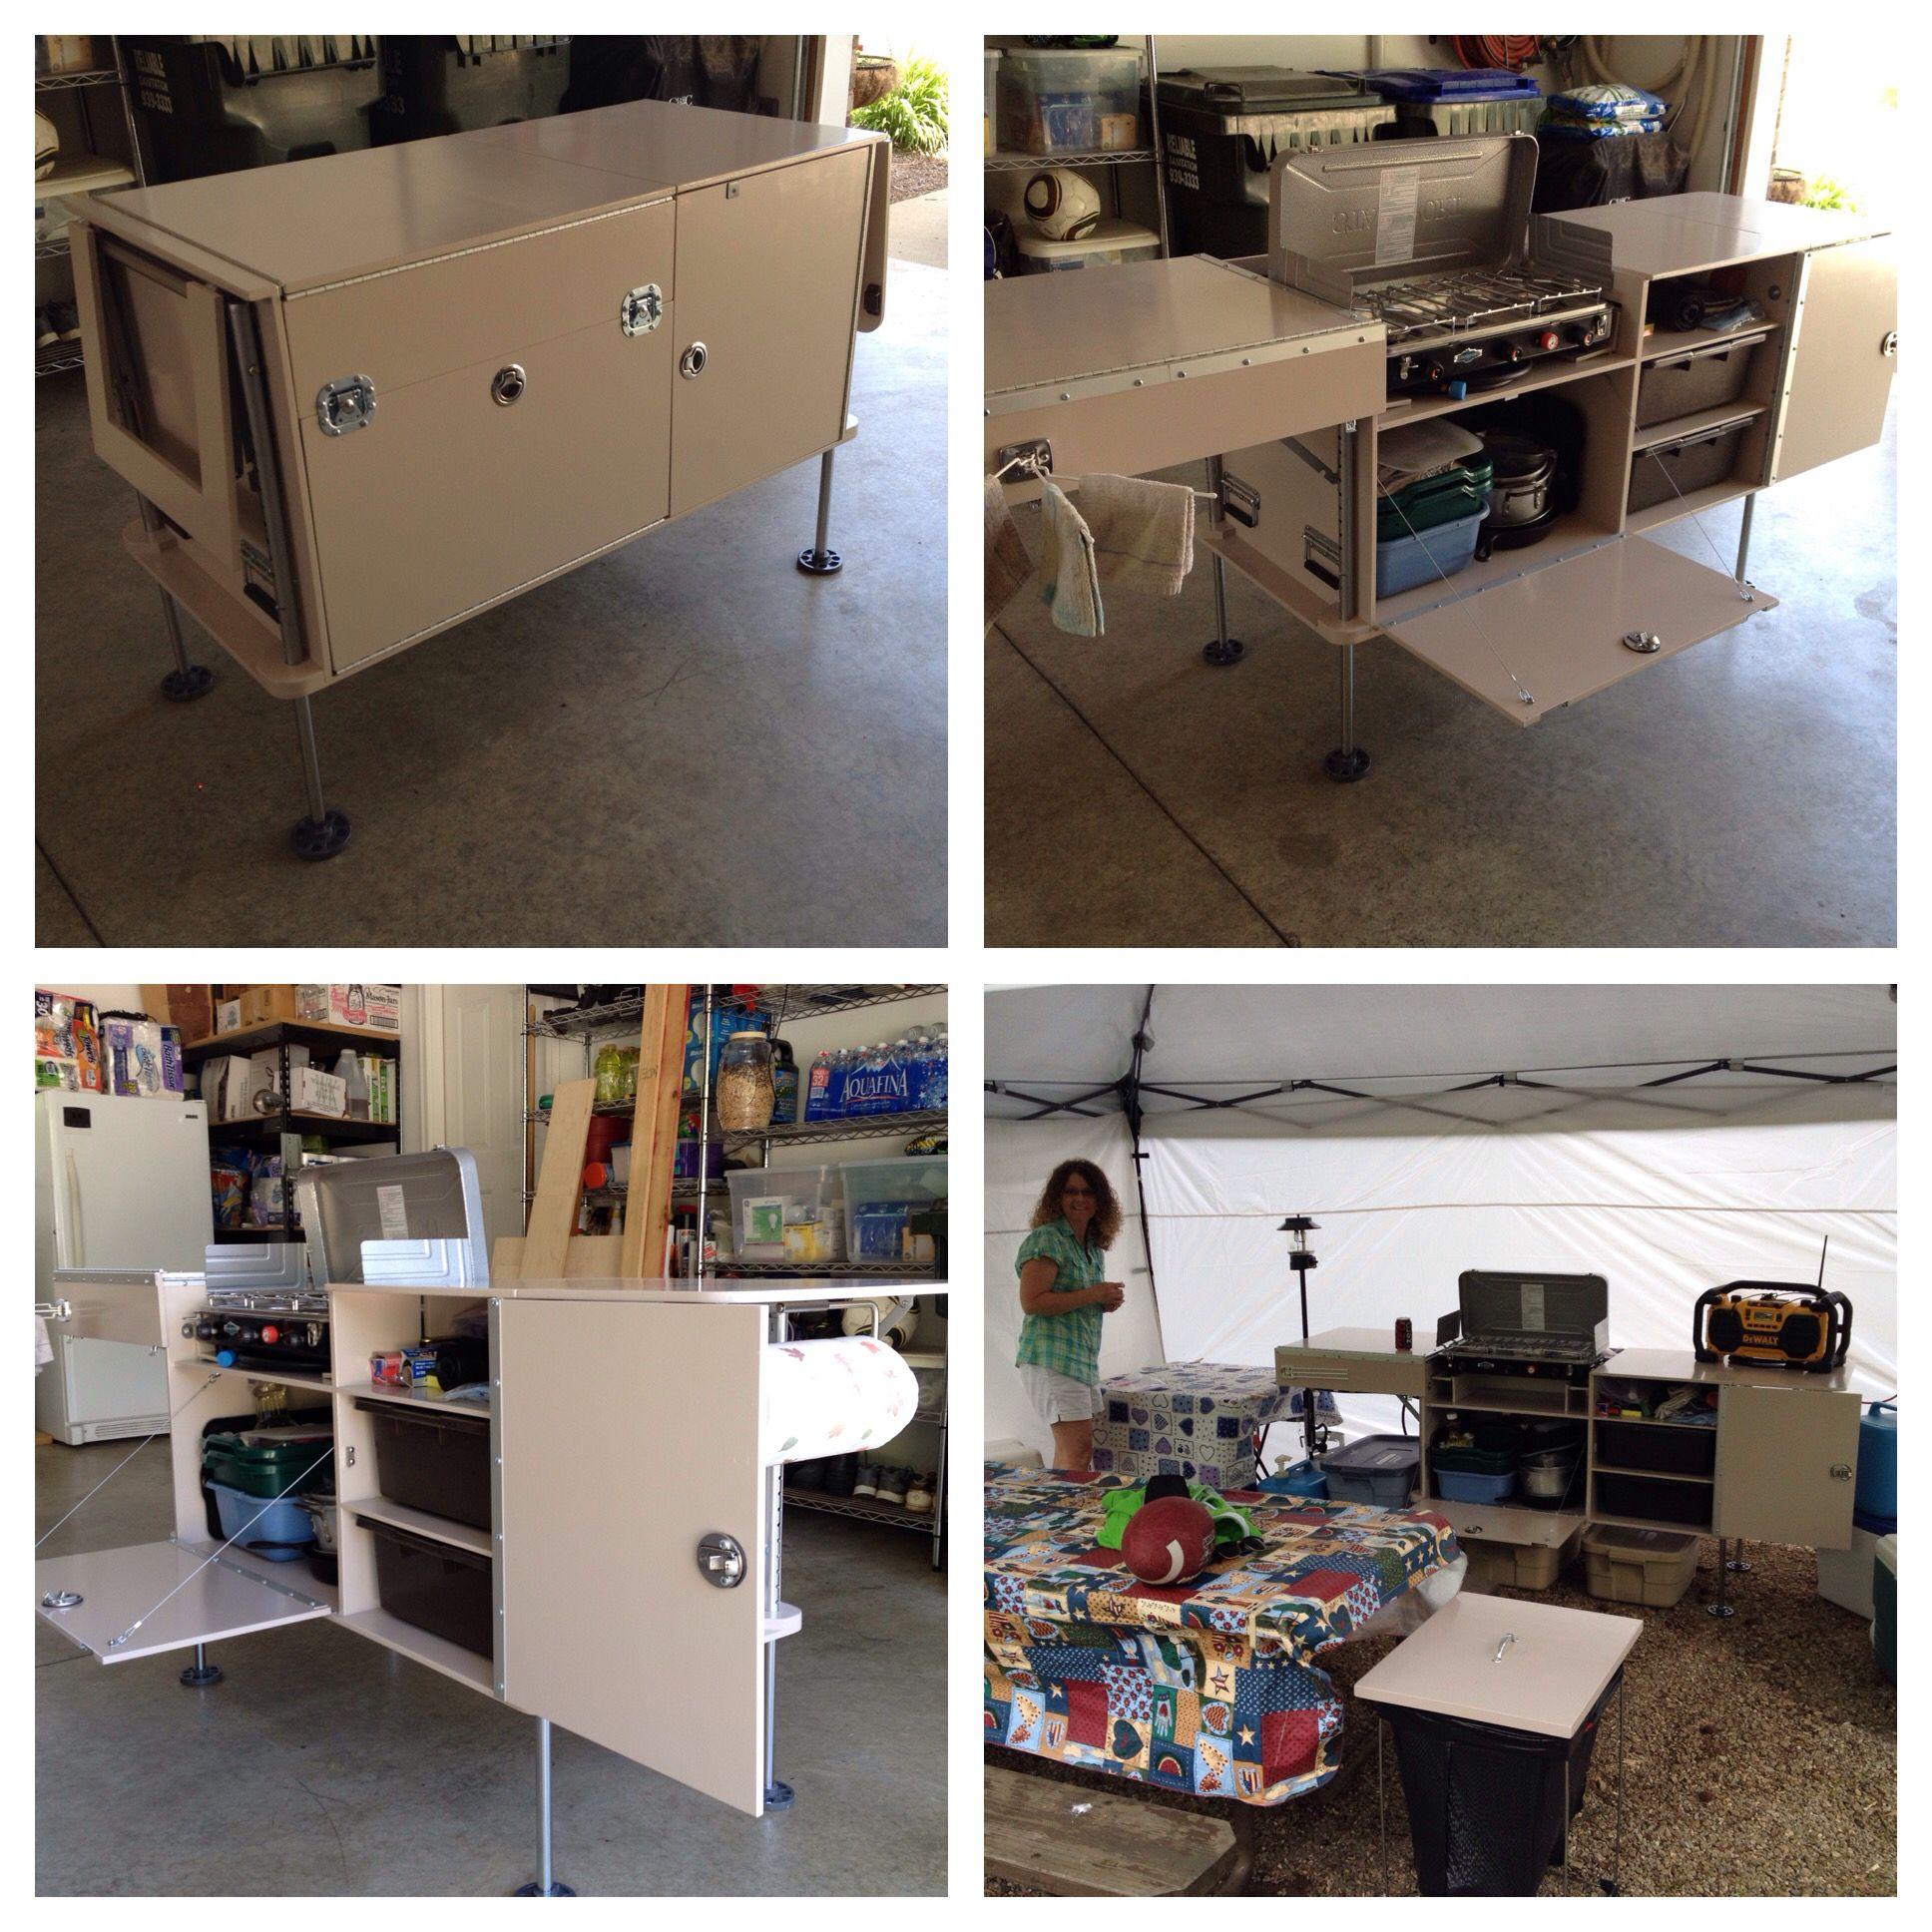 Kitchen Set Up: Chuck Box / Camp Kitchen. Constructed Of Baltic Birch